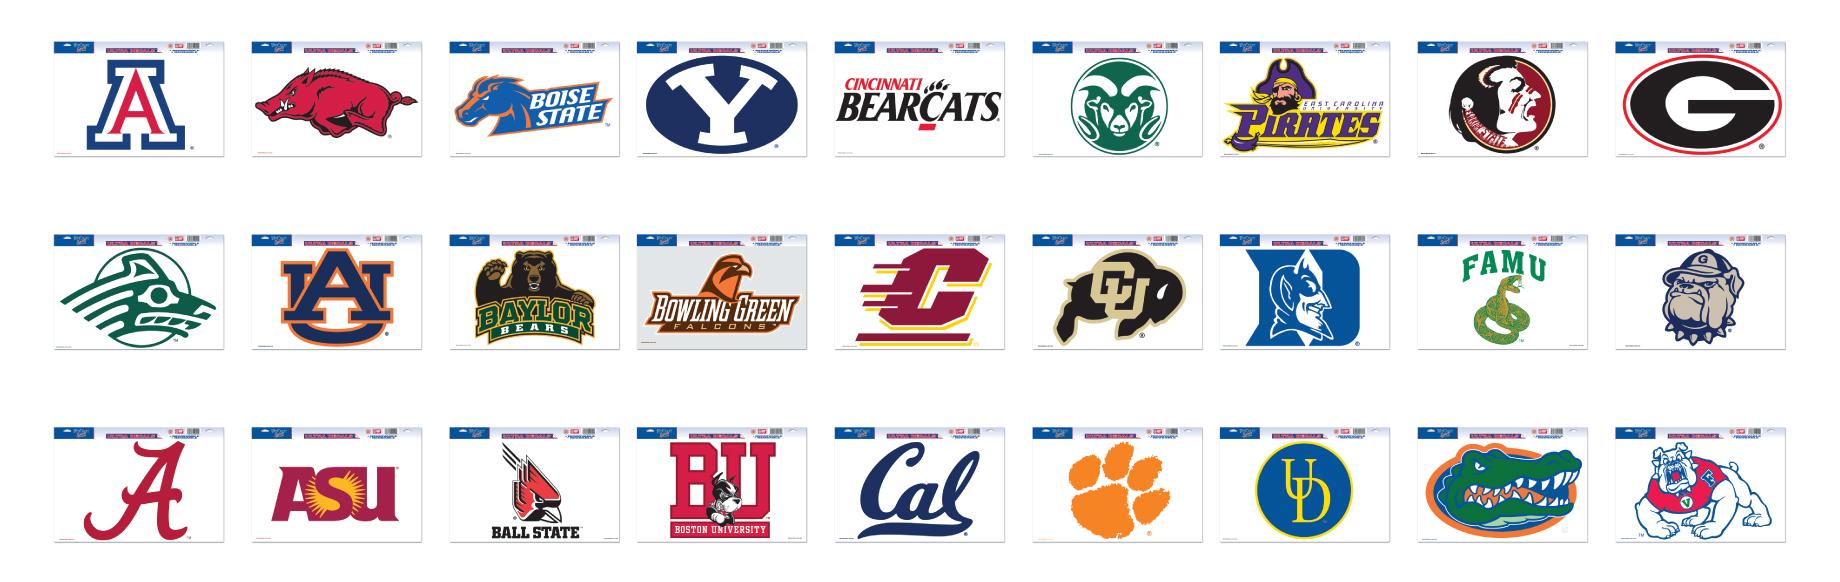 ncaa football logo college football league